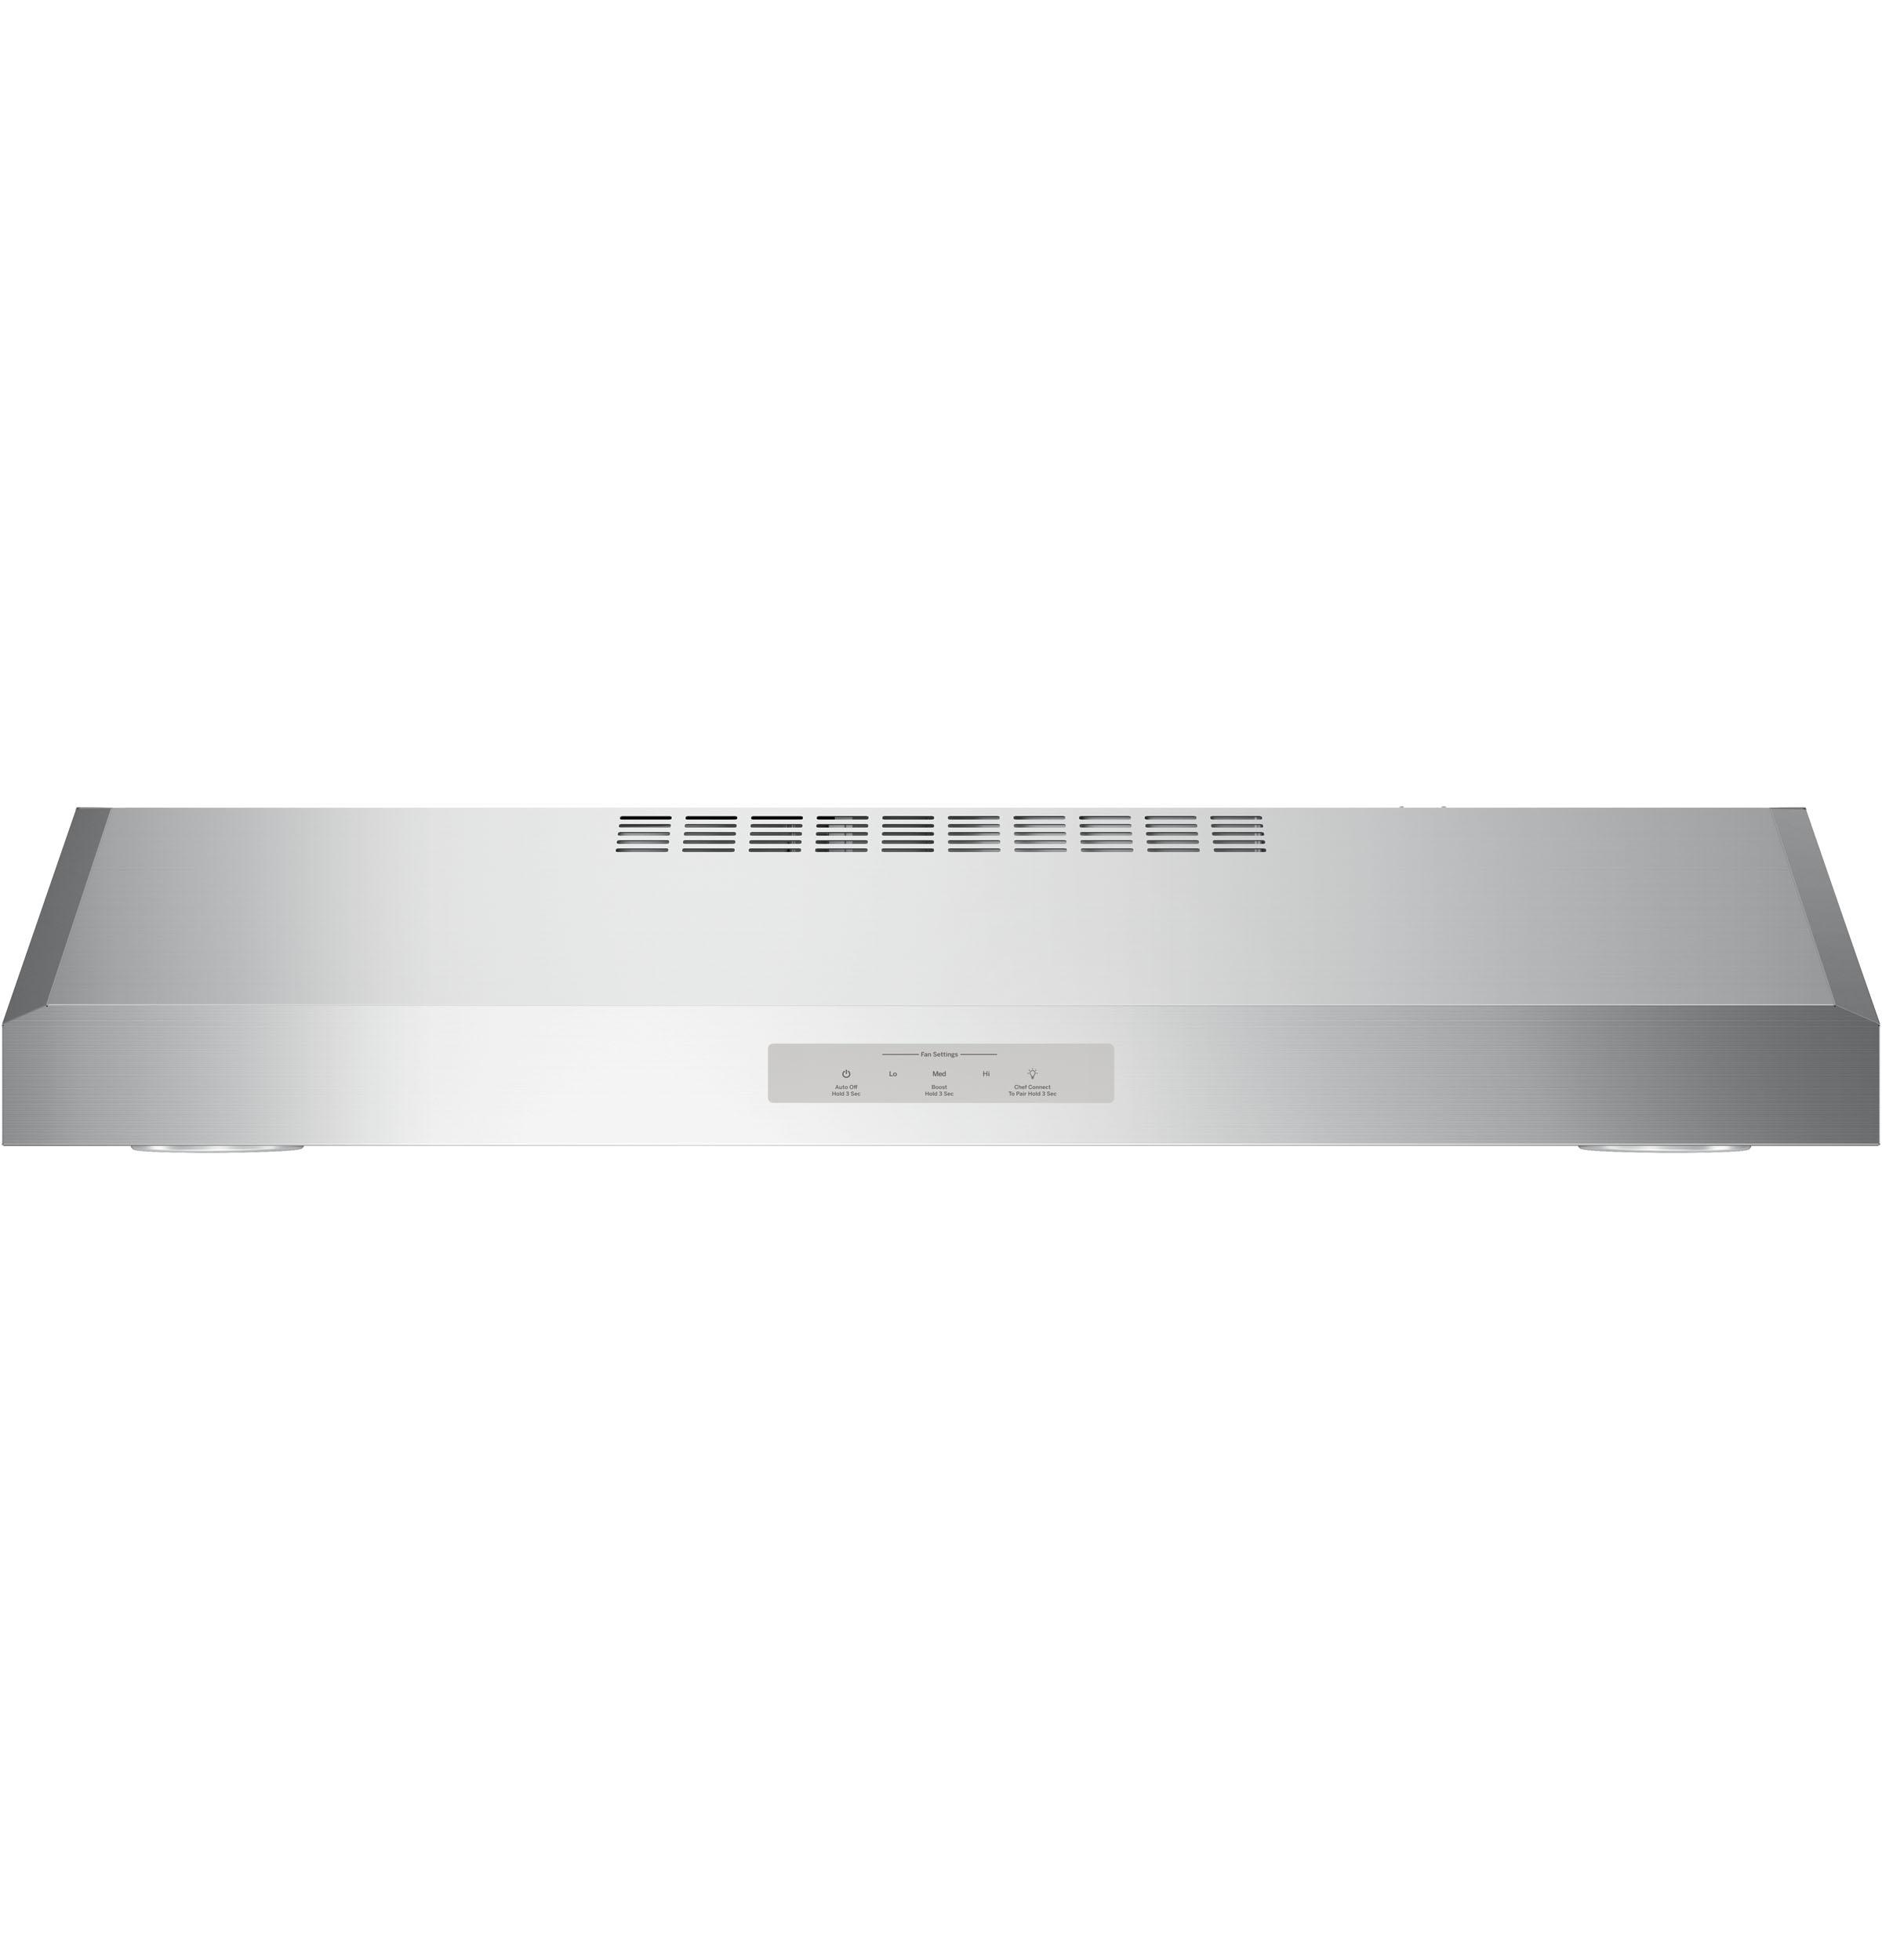 Model: PVX7300SJSS | GE Profile™ Series 30